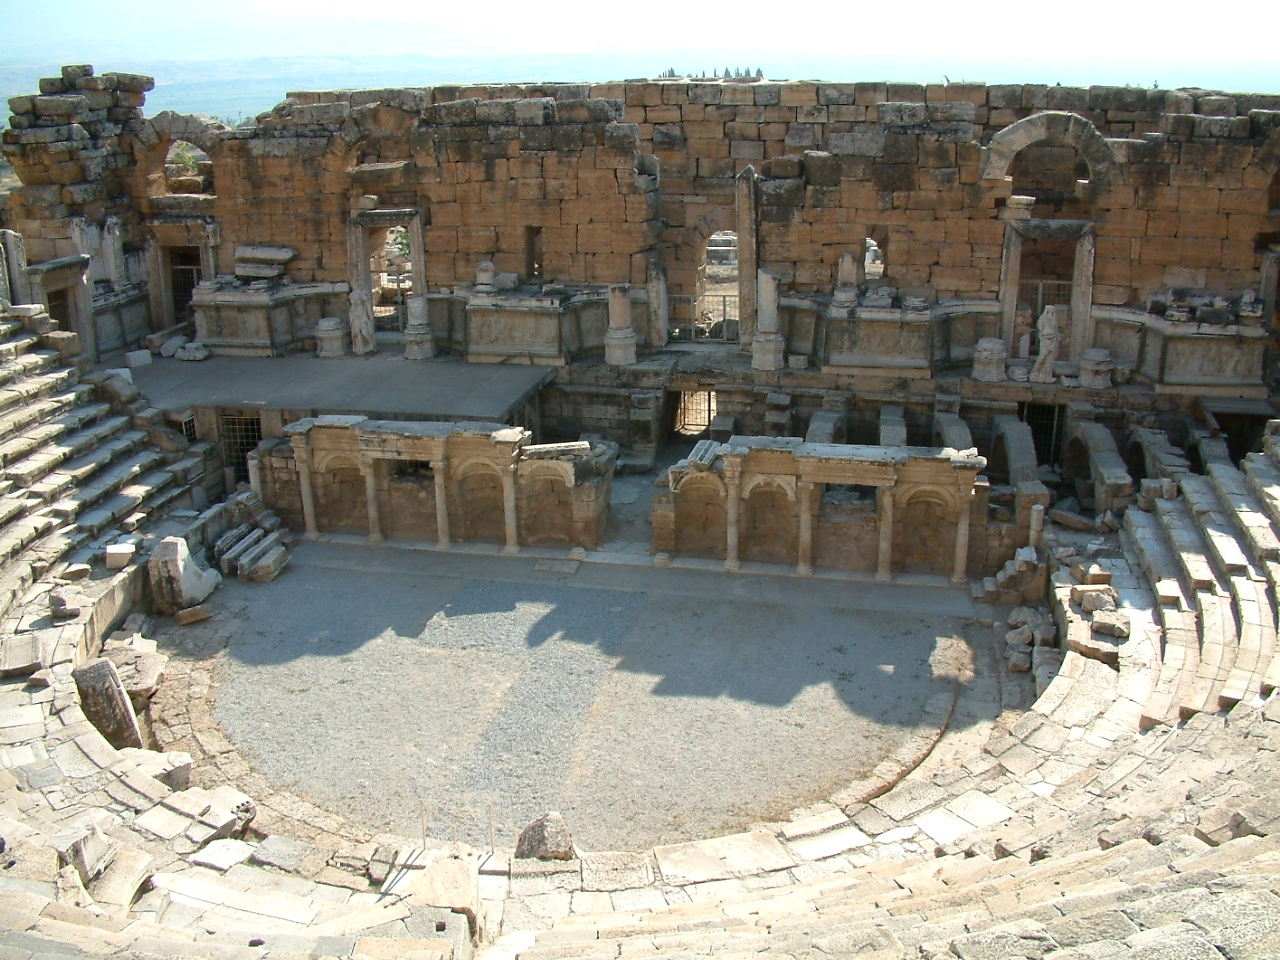 File:Hierapolis teatr3 RB.jpg - Wikimedia Commons